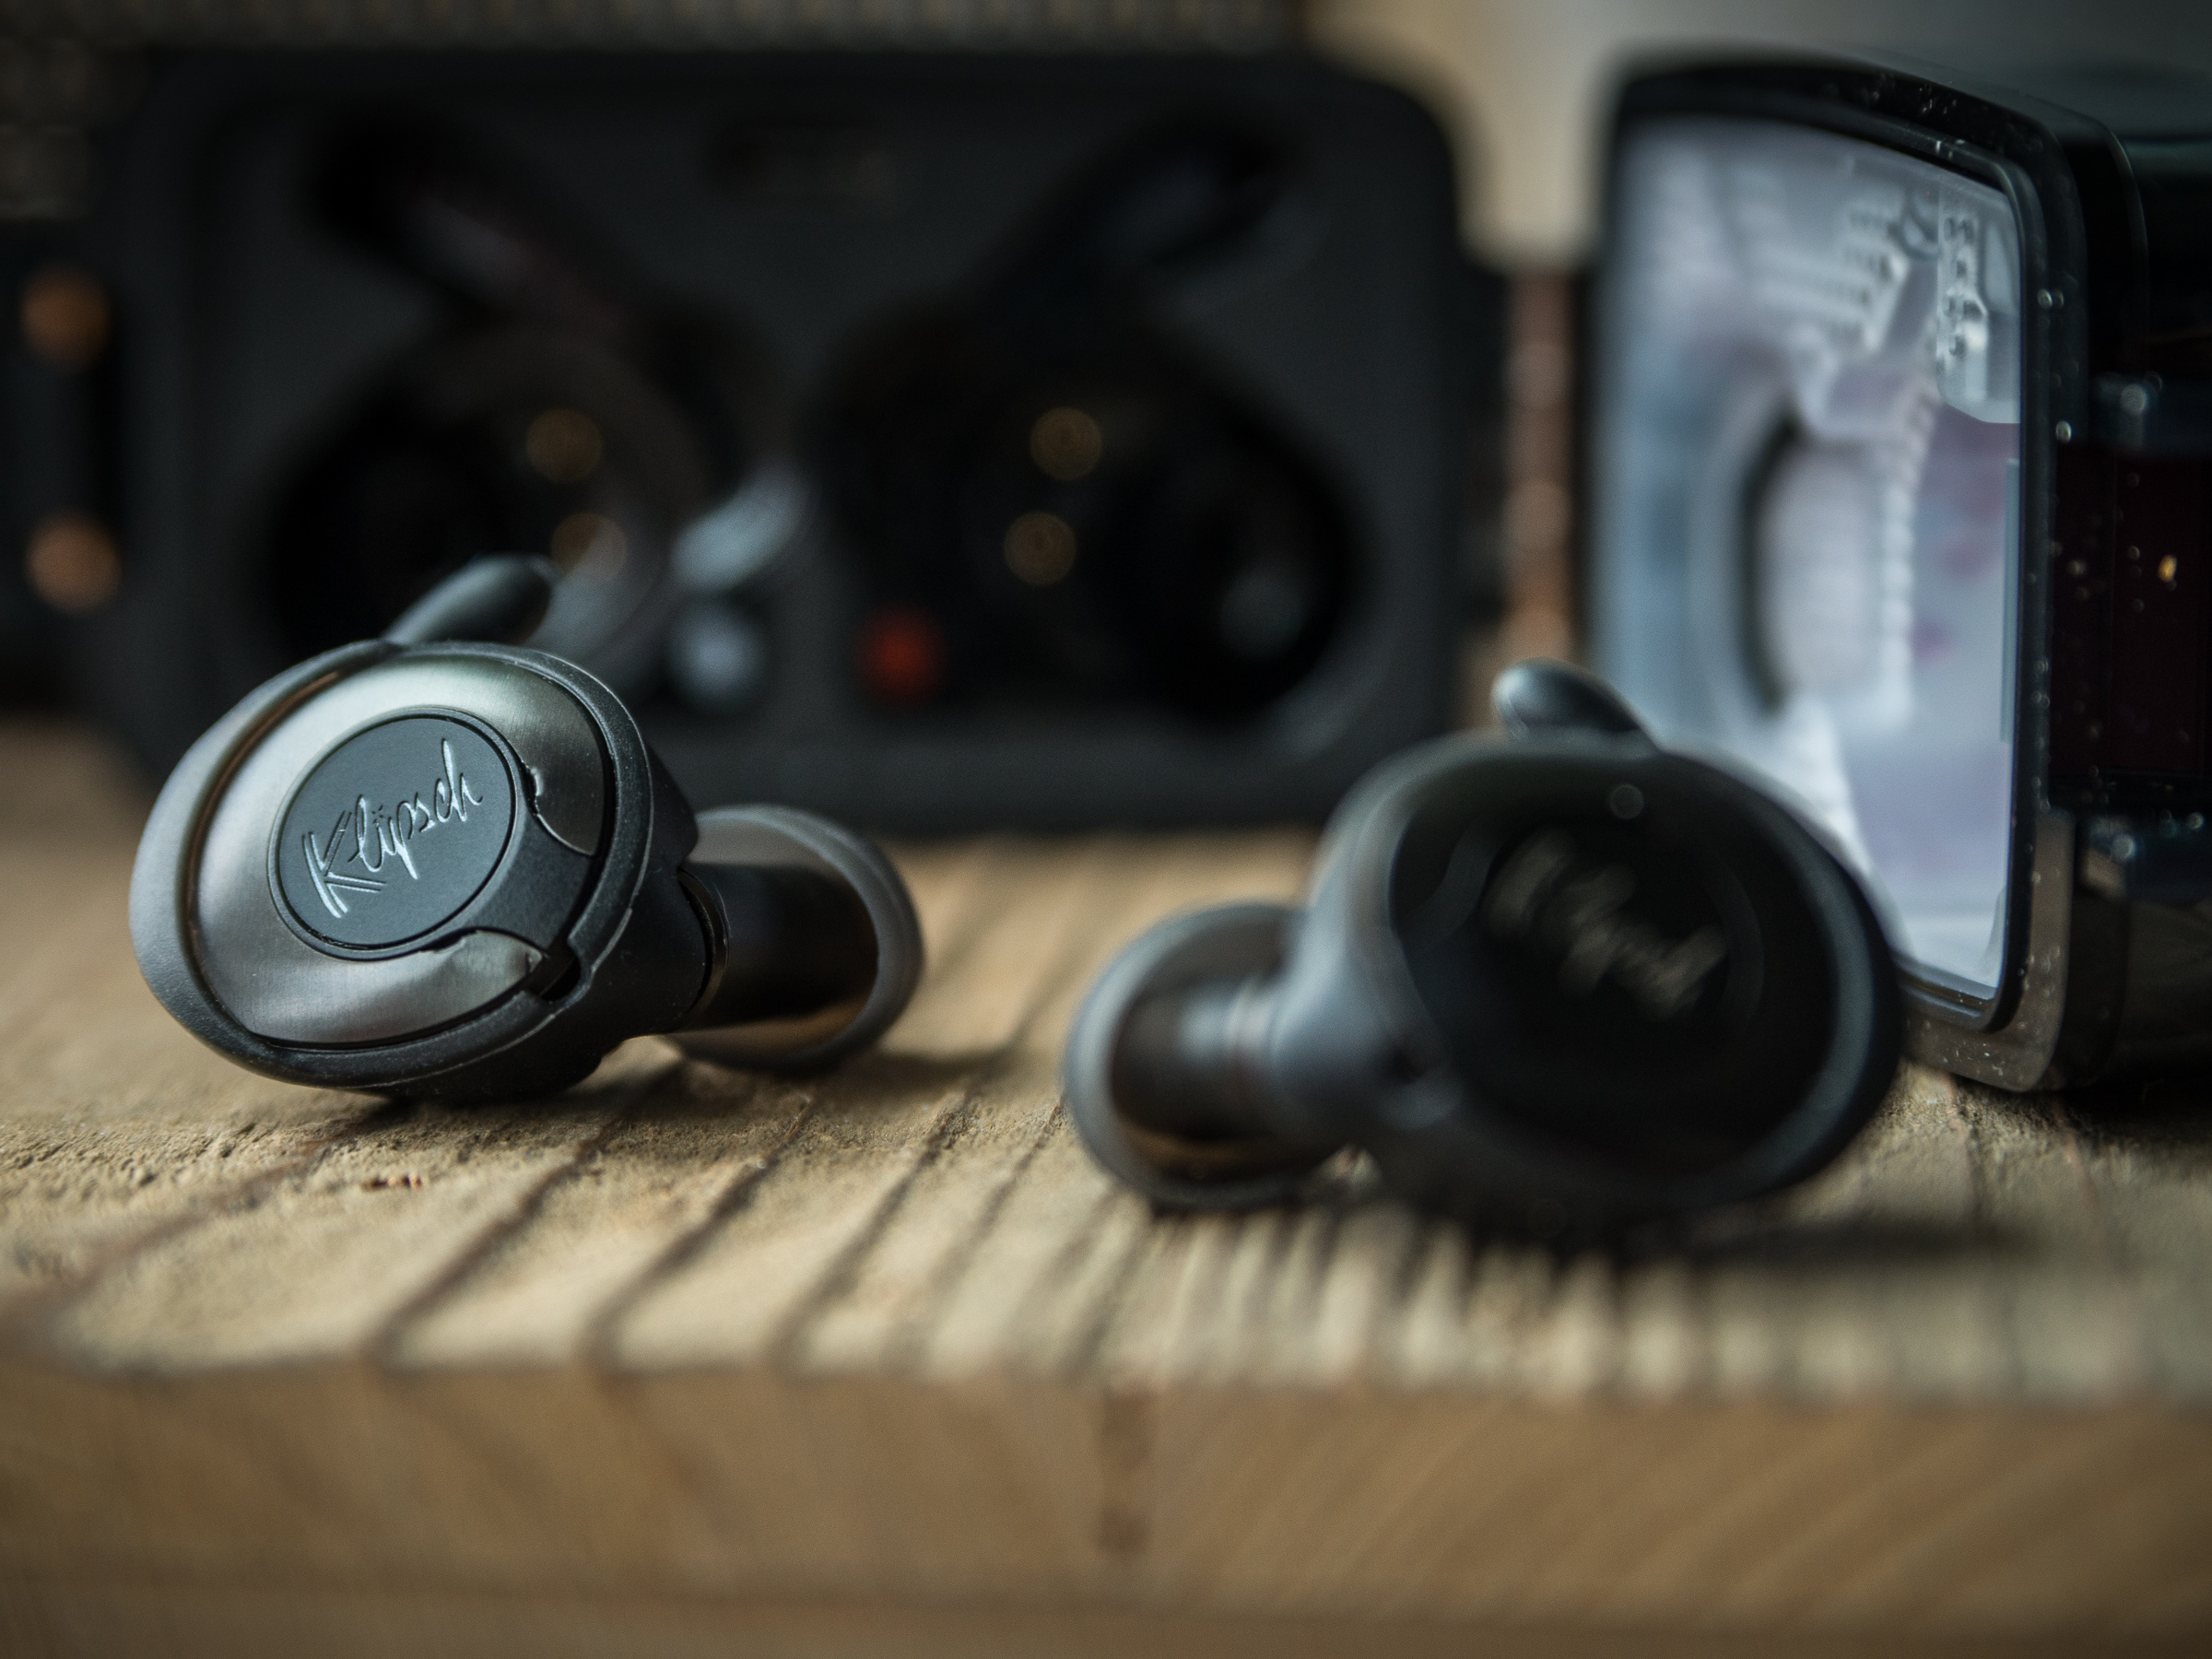 The sound of the clip headphones is unique